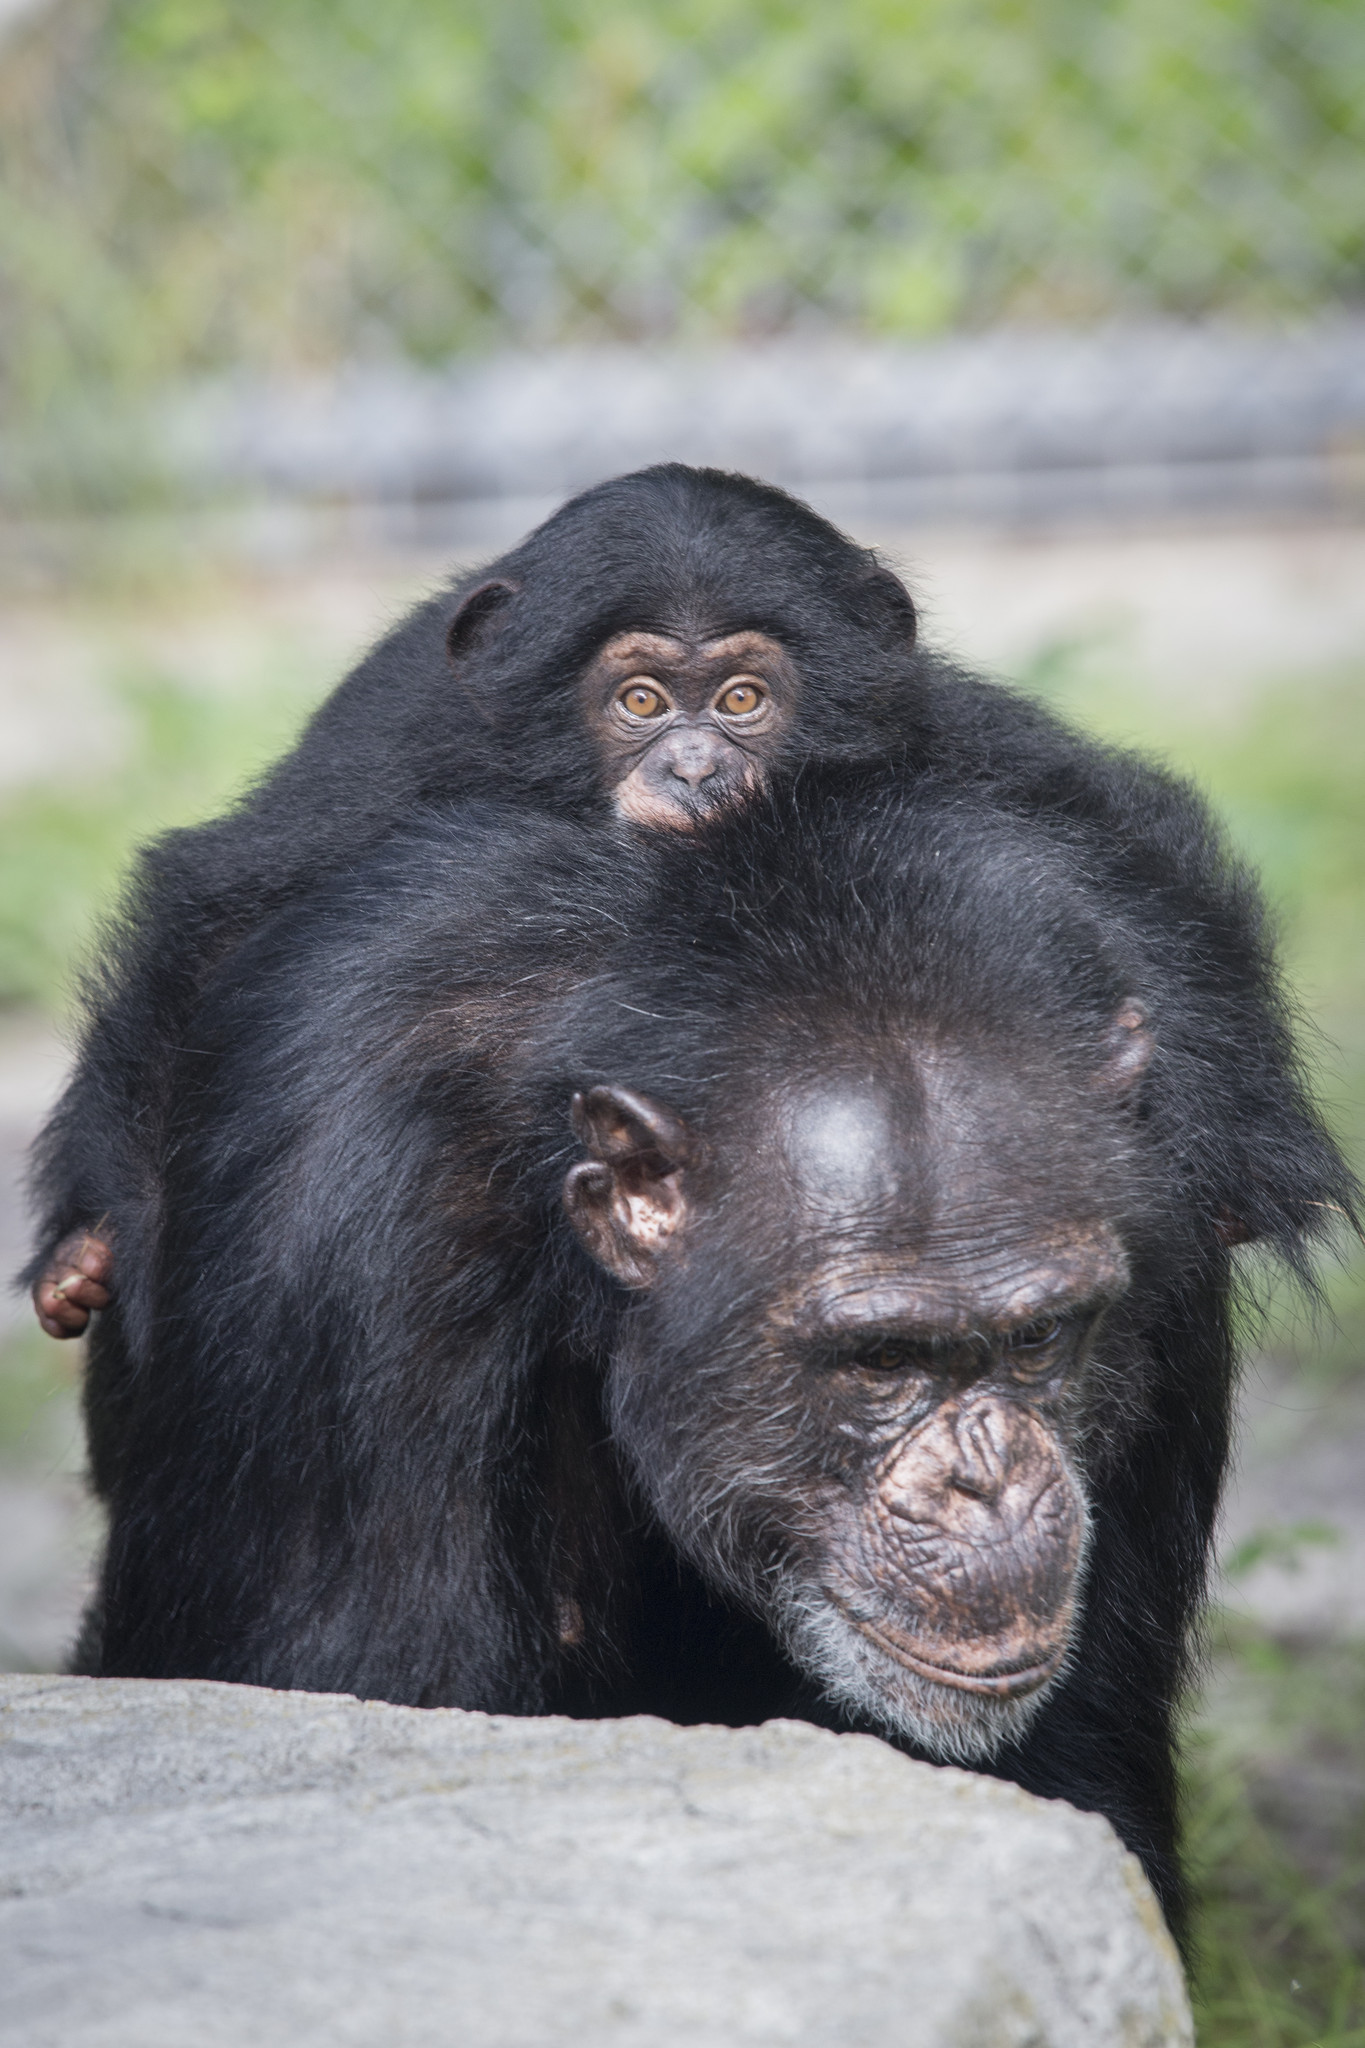 Baby chimp from Baltimore meets surrogate chimp mom - Baltimore Sun